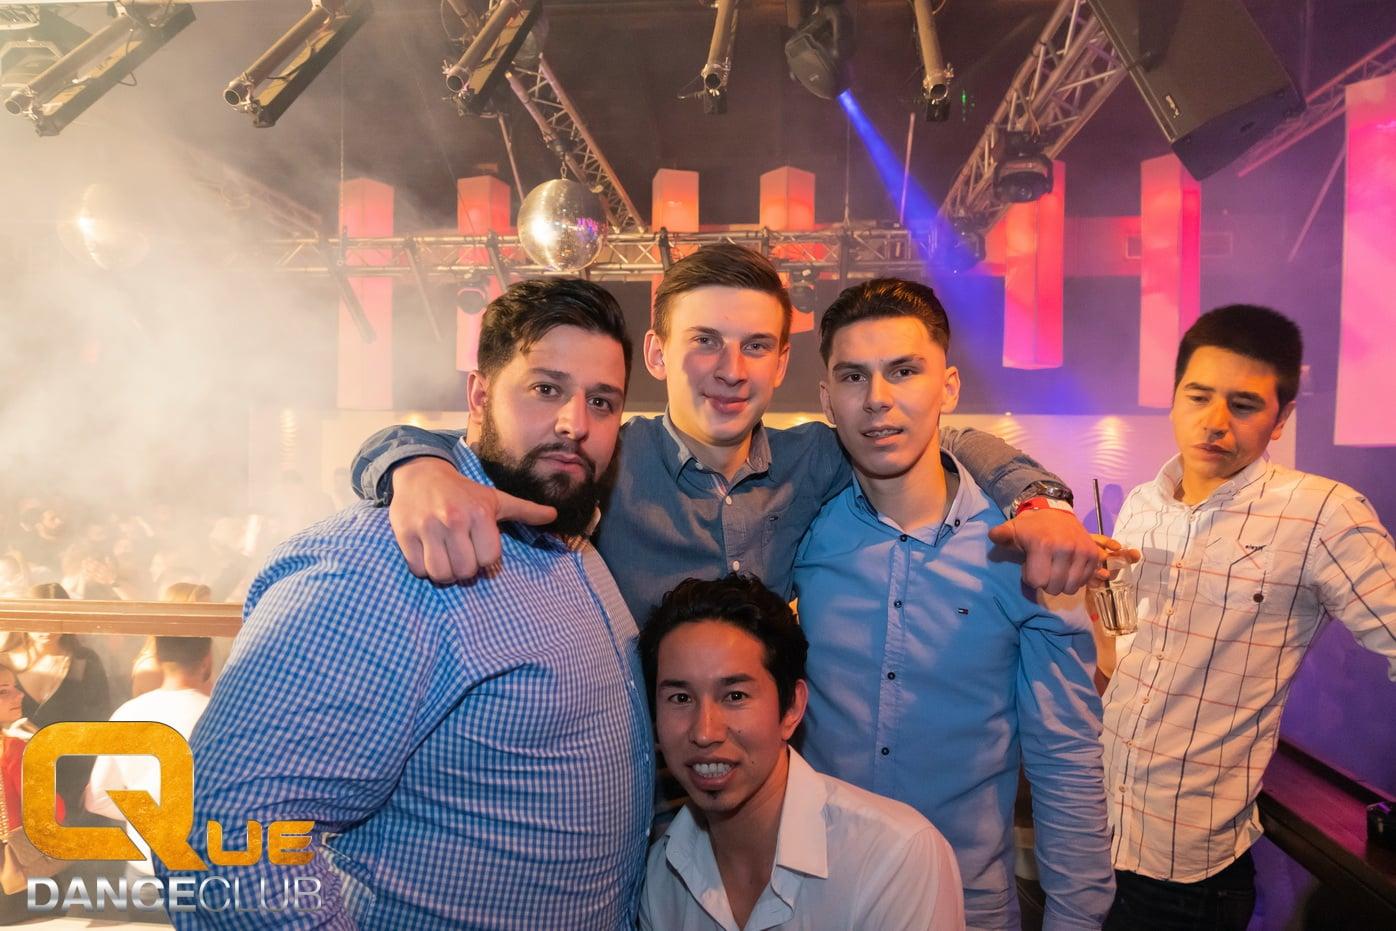 2018_12_08_Que_Danceclub_Paparazzo_Night_Ardian_Bujupi_Live_Nightlife_Scene_Timo_037